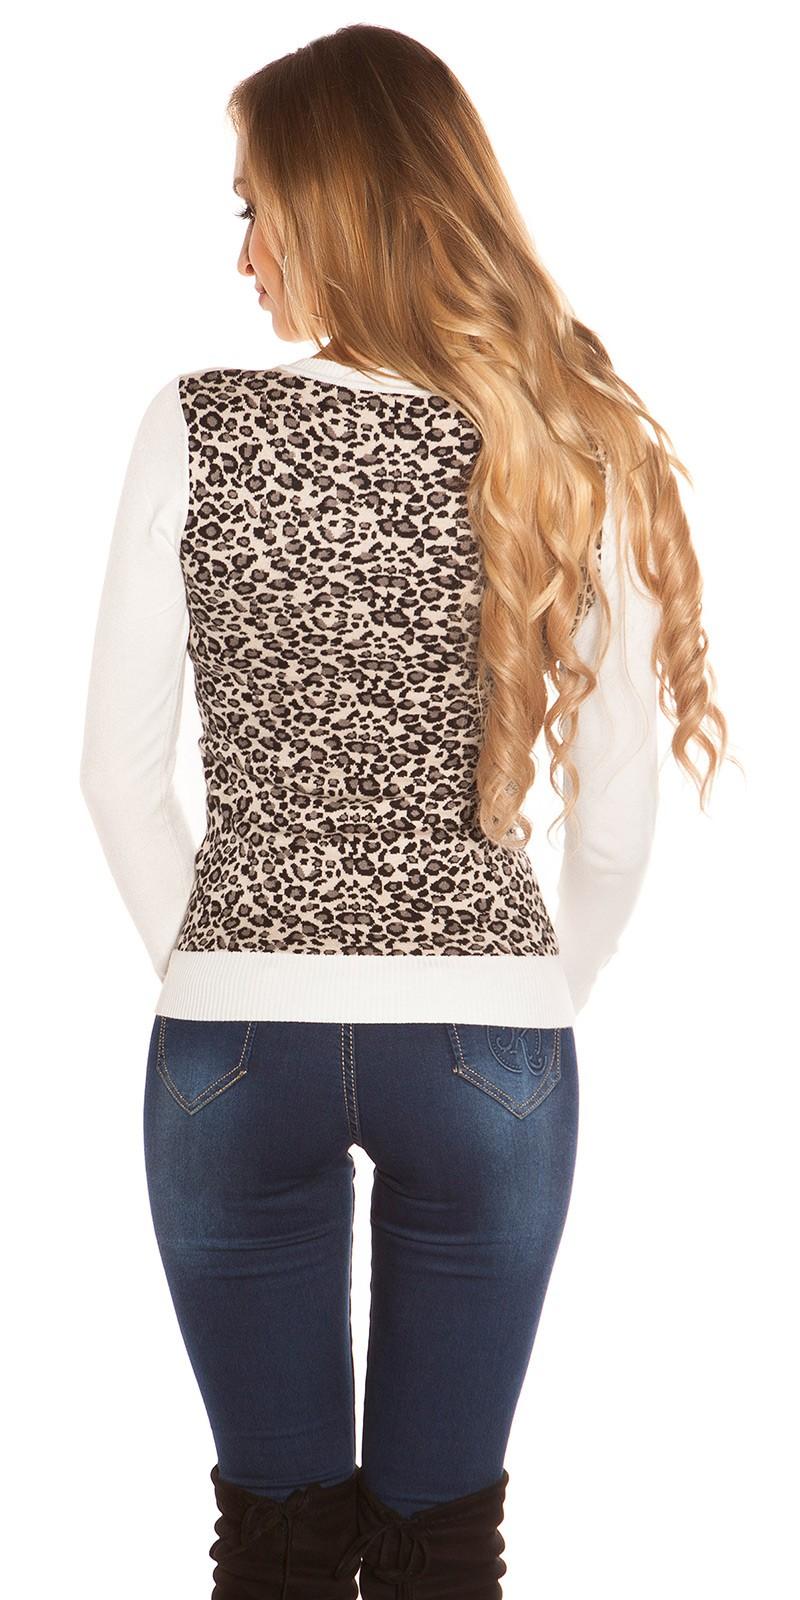 Leo hátú női pulóver - Fehér (S M) empty 3eb2b76c09